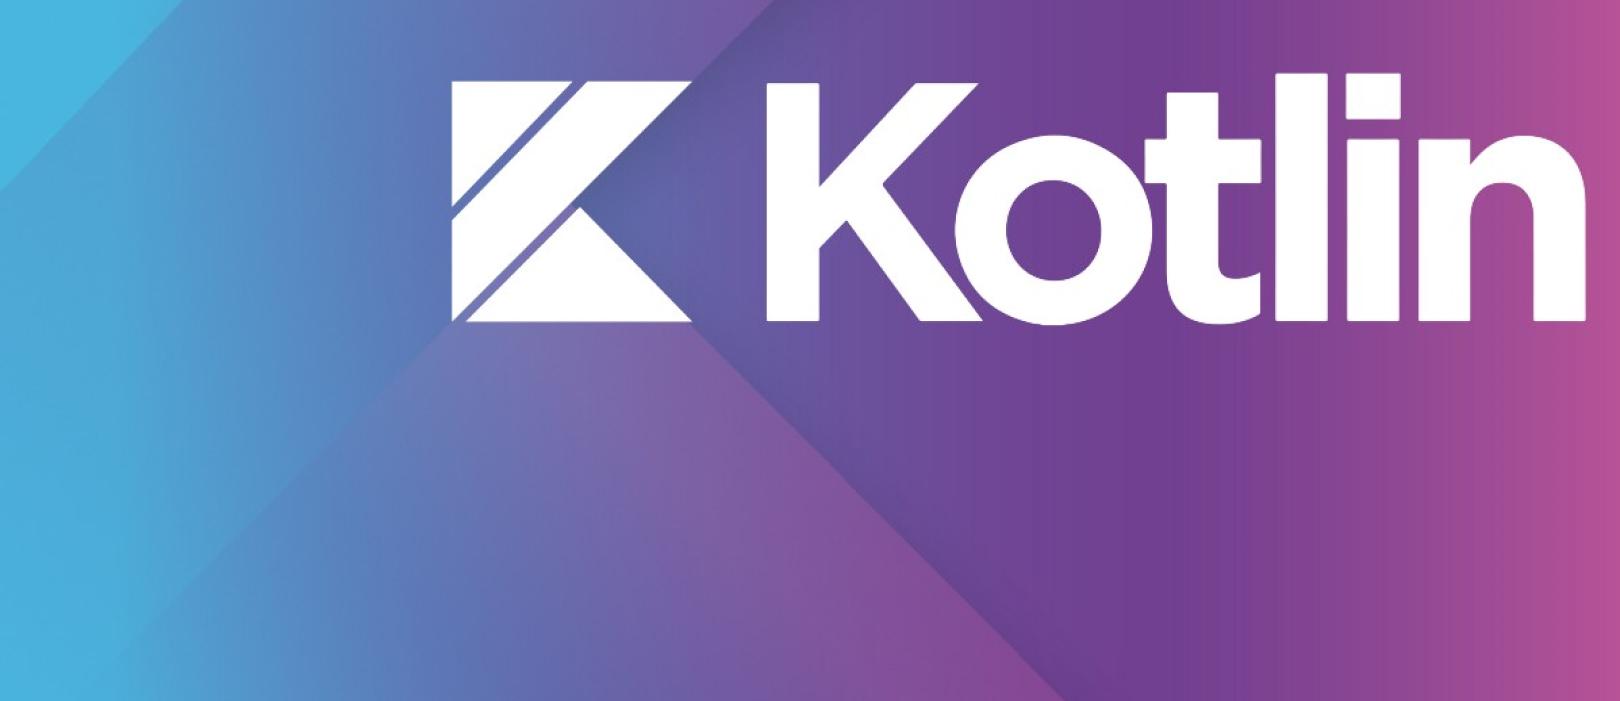 Frame 1 8 1 - Kotlin для приложений на Android: плюсы и минусы языка